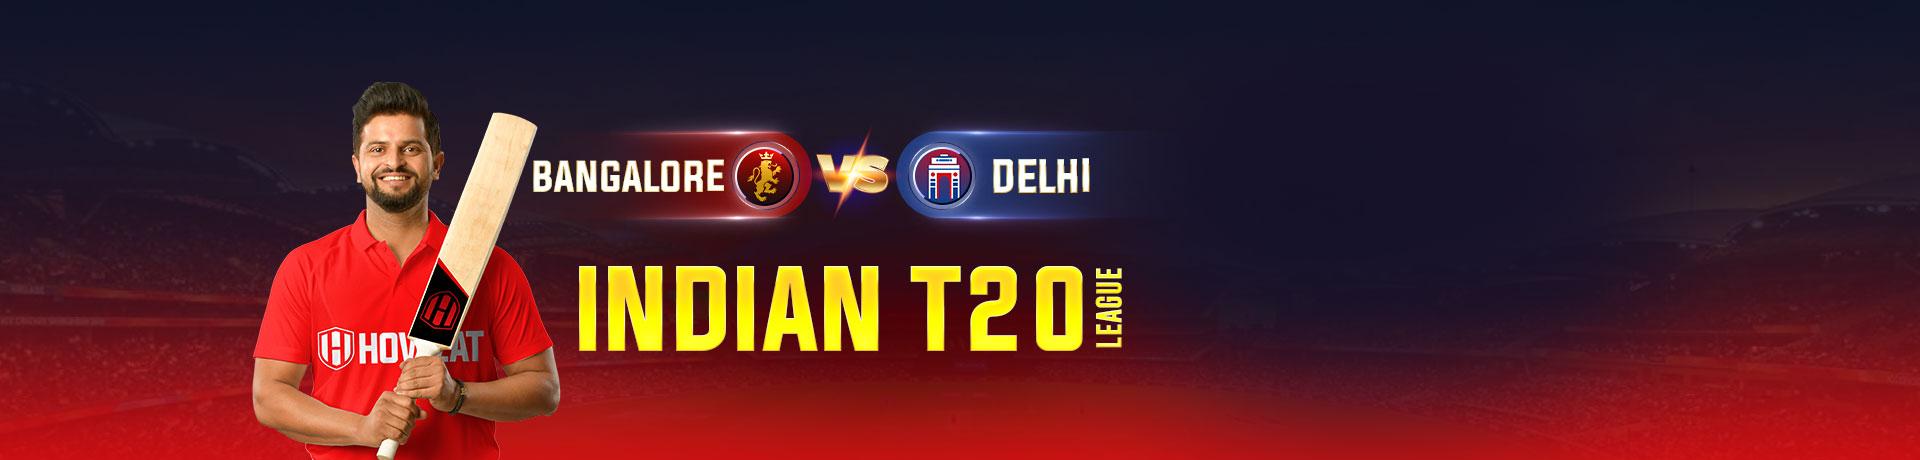 Bangalore vs Delhi Indian T20 League